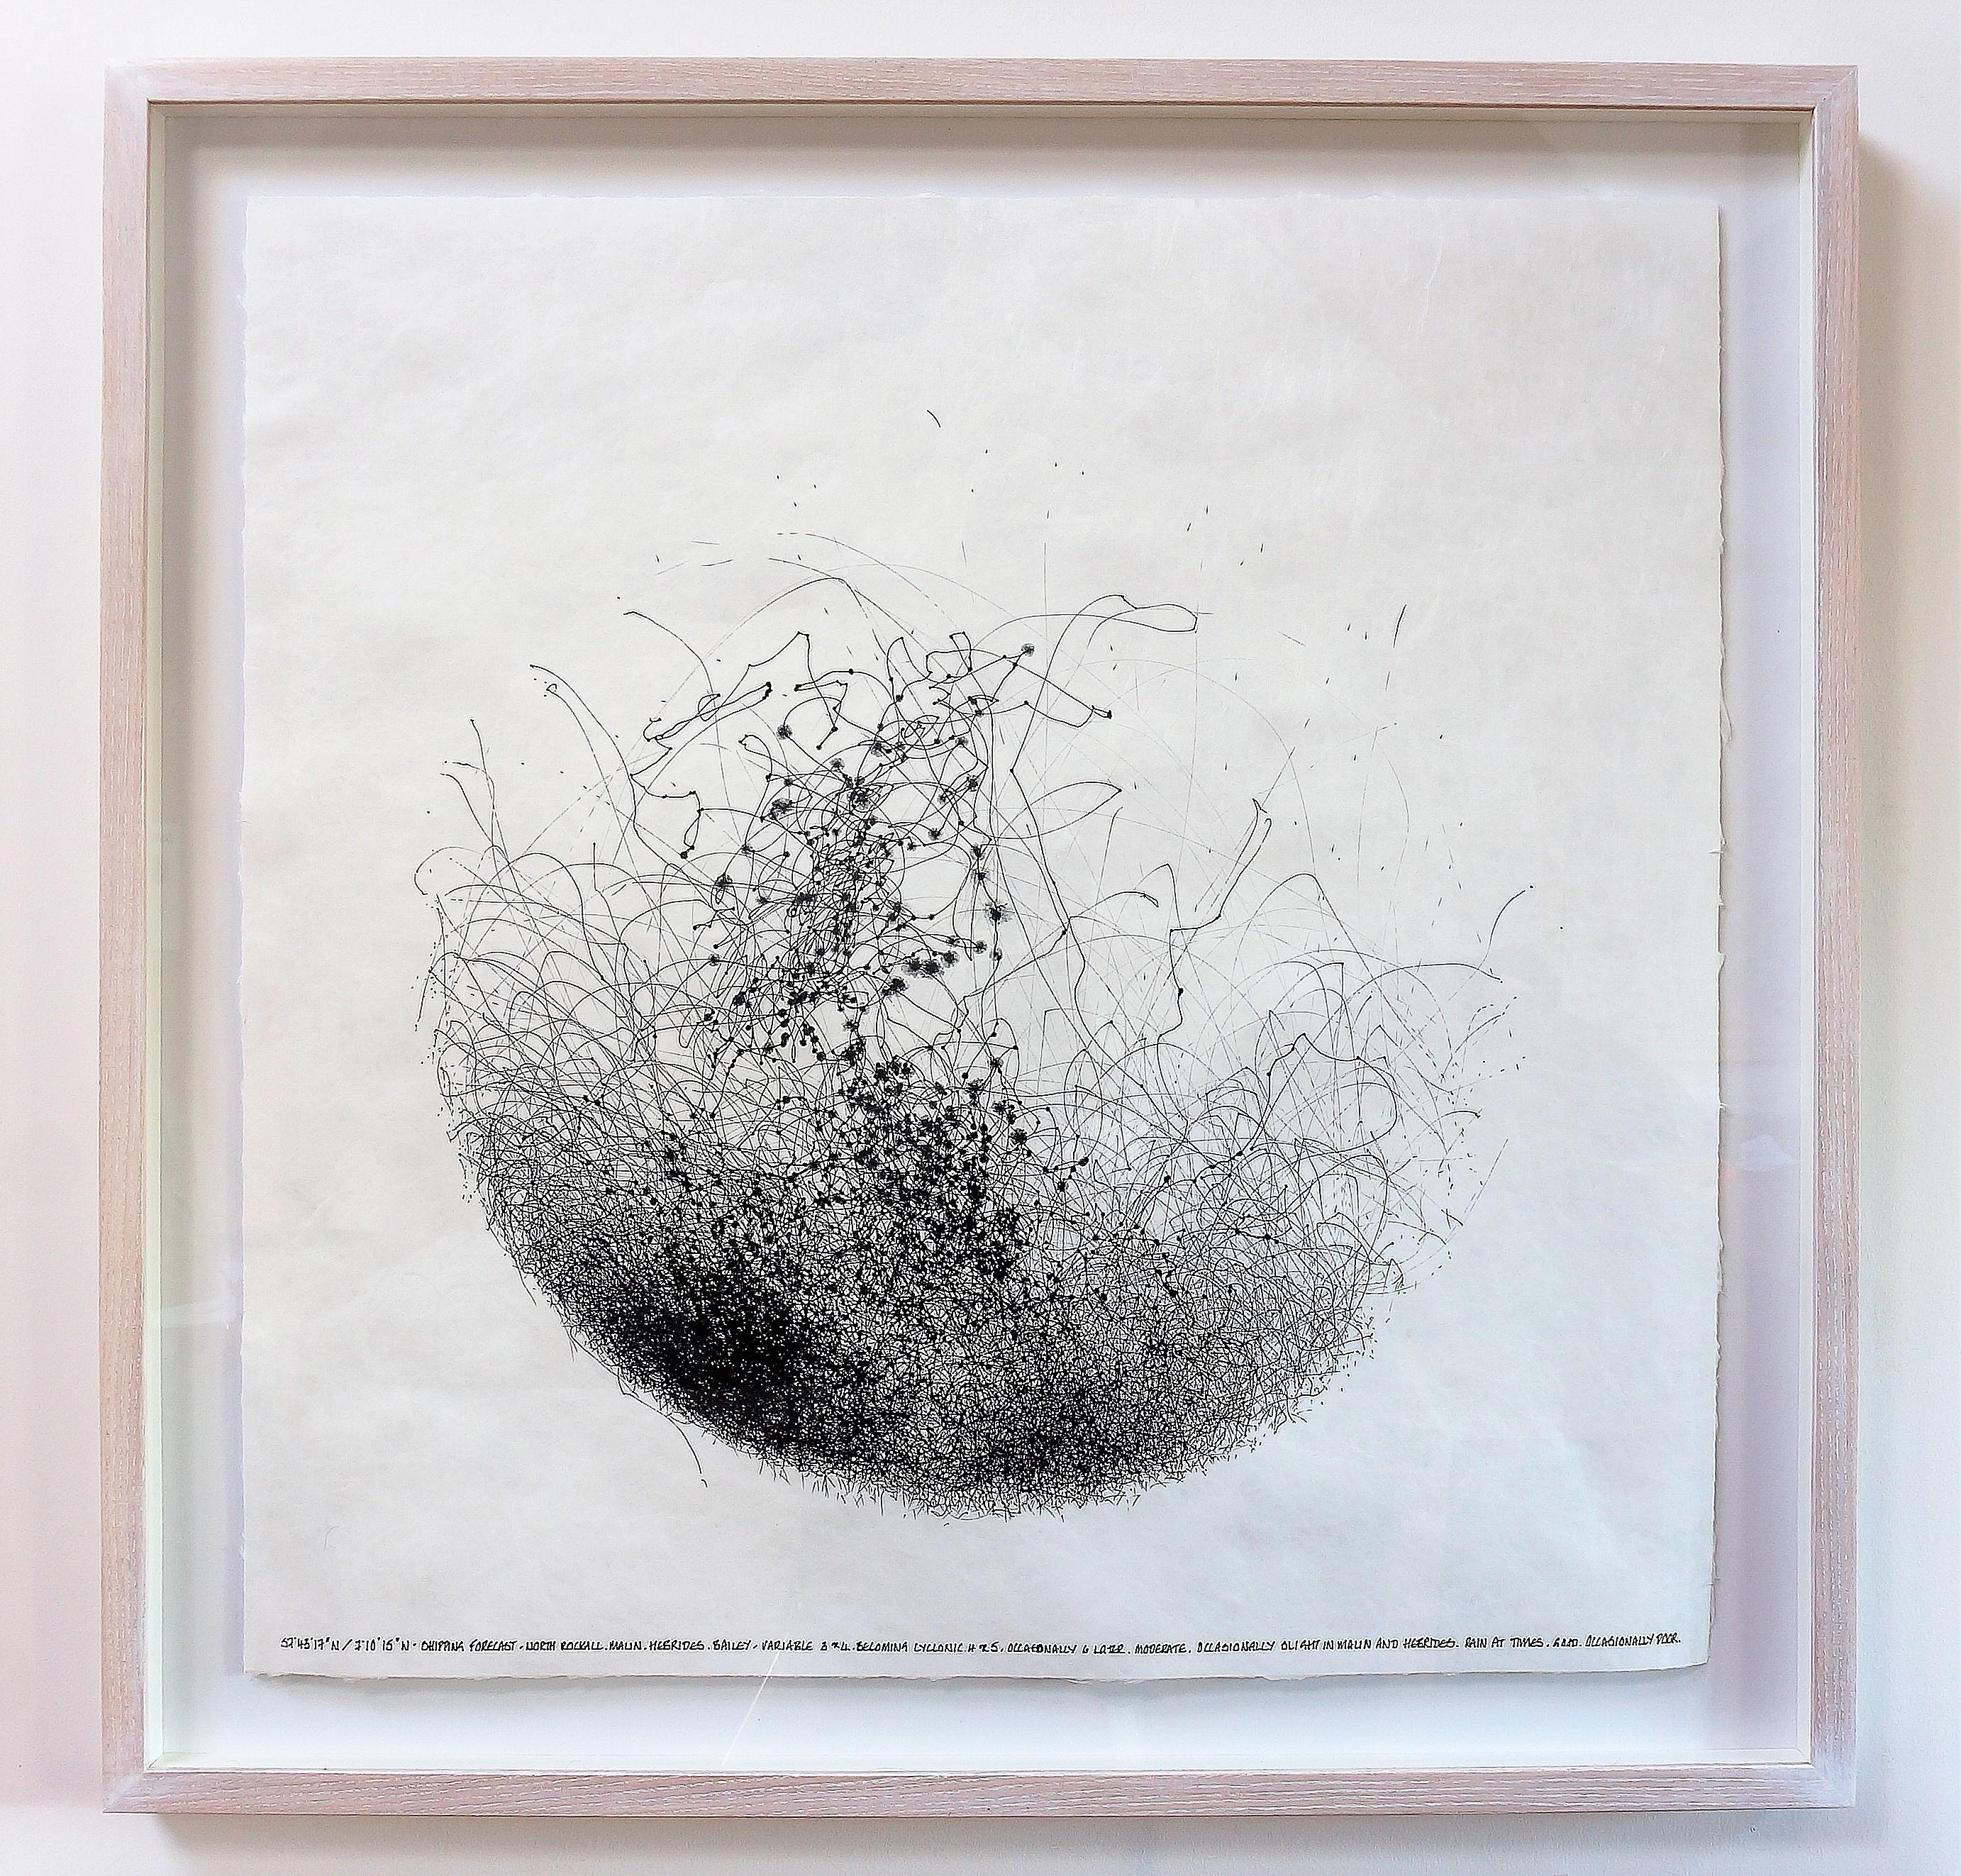 North Rockall Malin Hebrides Bailey - Wind drawing 1